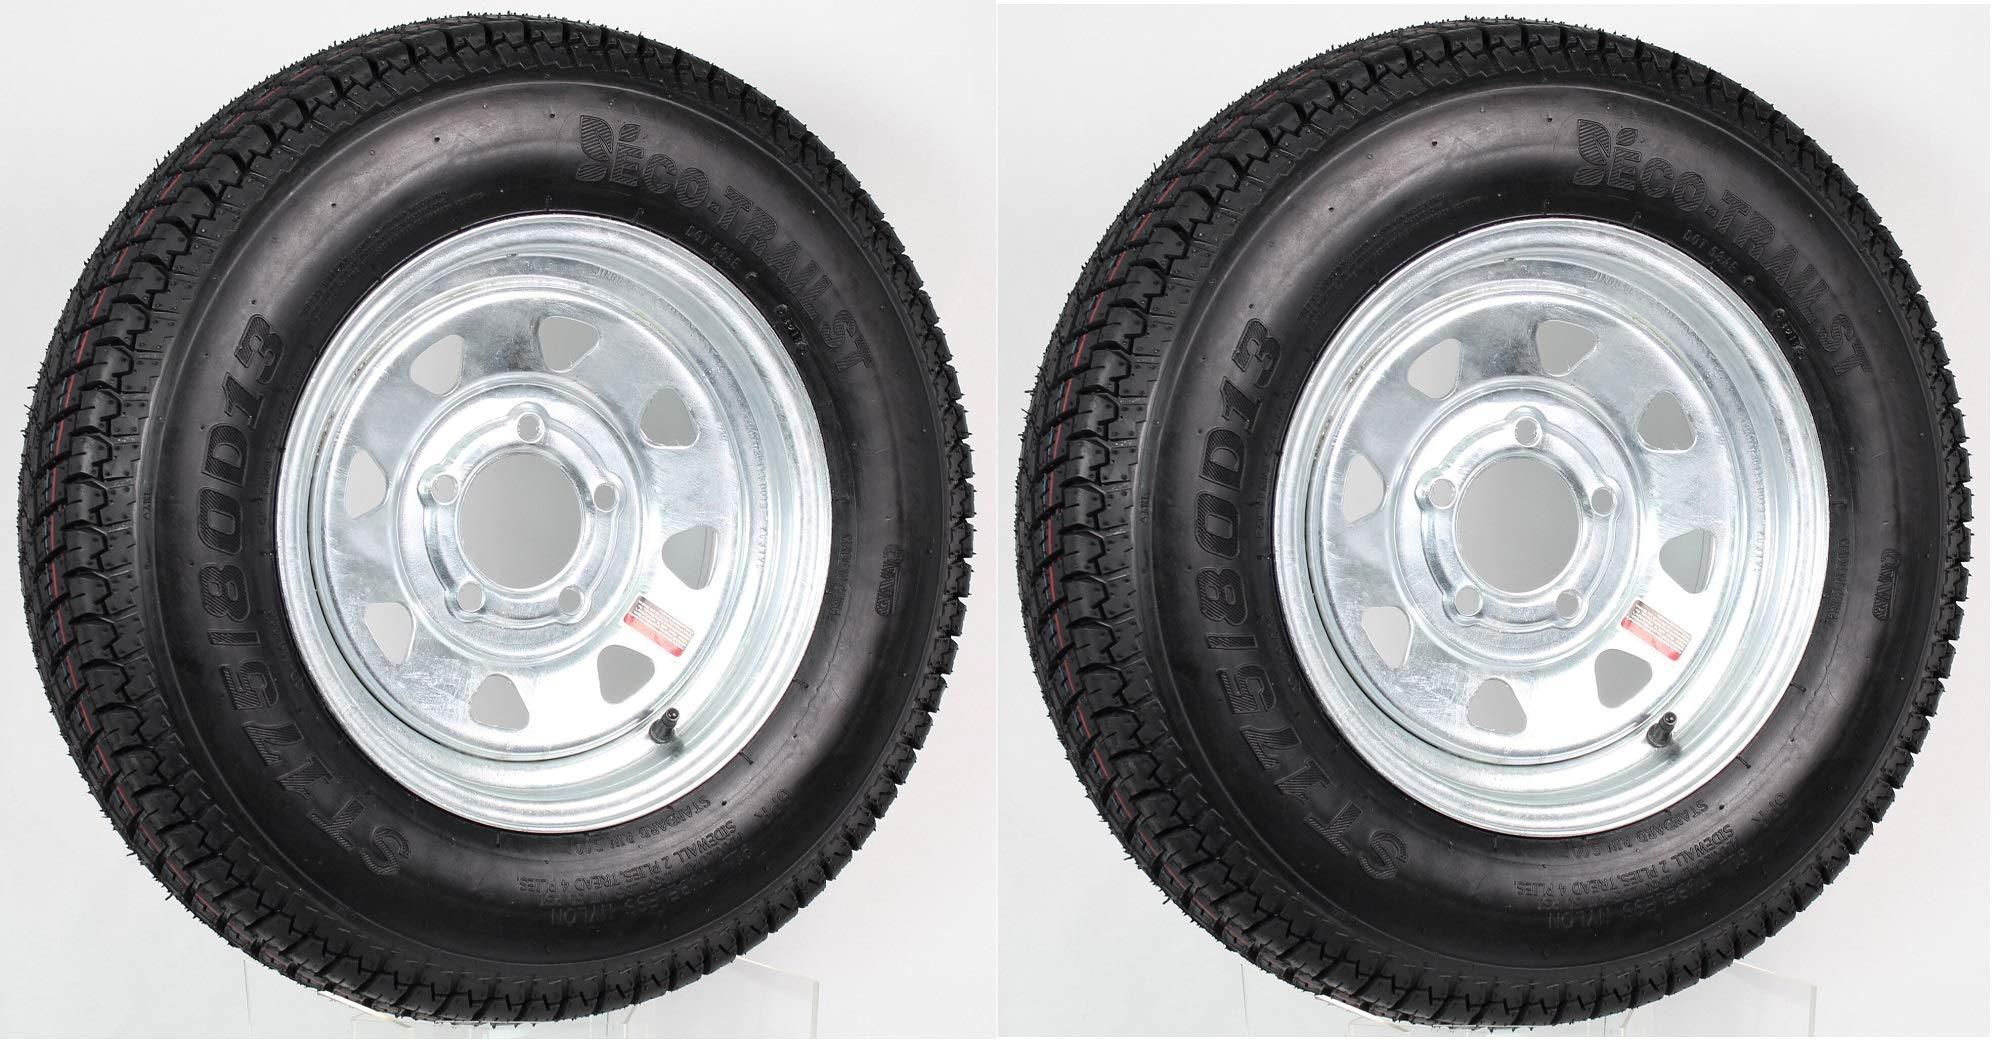 eCustomRim 2-Pk Eco Trailer Tire & Rim ST175/80D13 13'' Load C 5 Lug Galvanized Spoke 58850